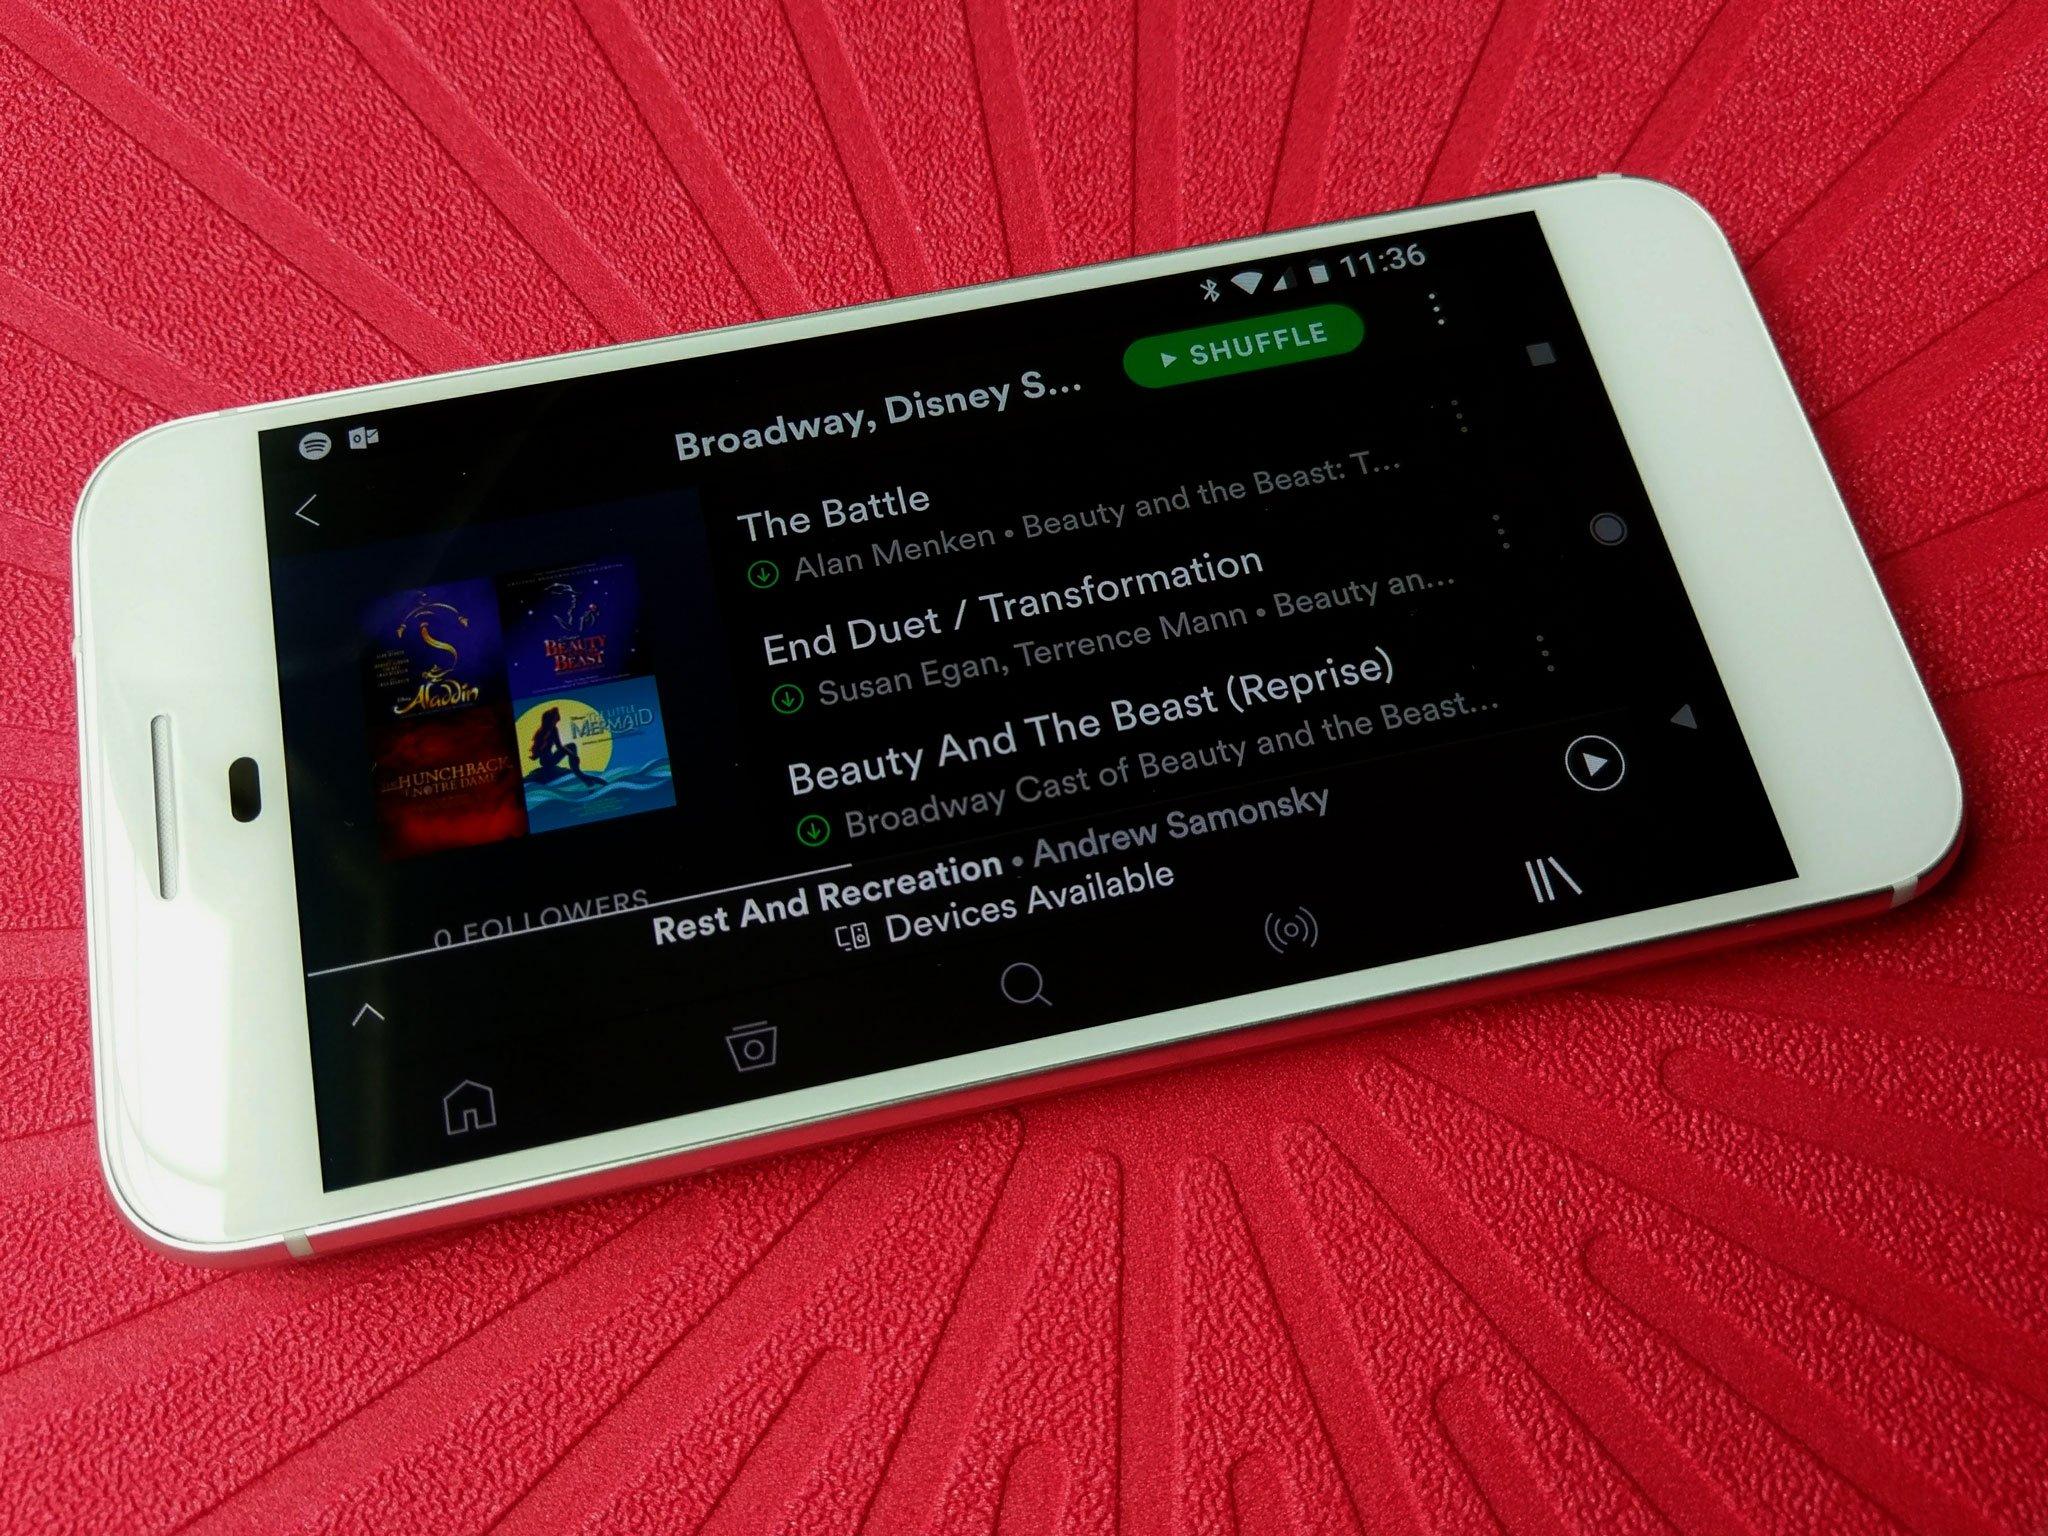 Other Formats Beautiful Spotify Premium X10 Account Subscription X1 Lifetime Warranty Worldwide